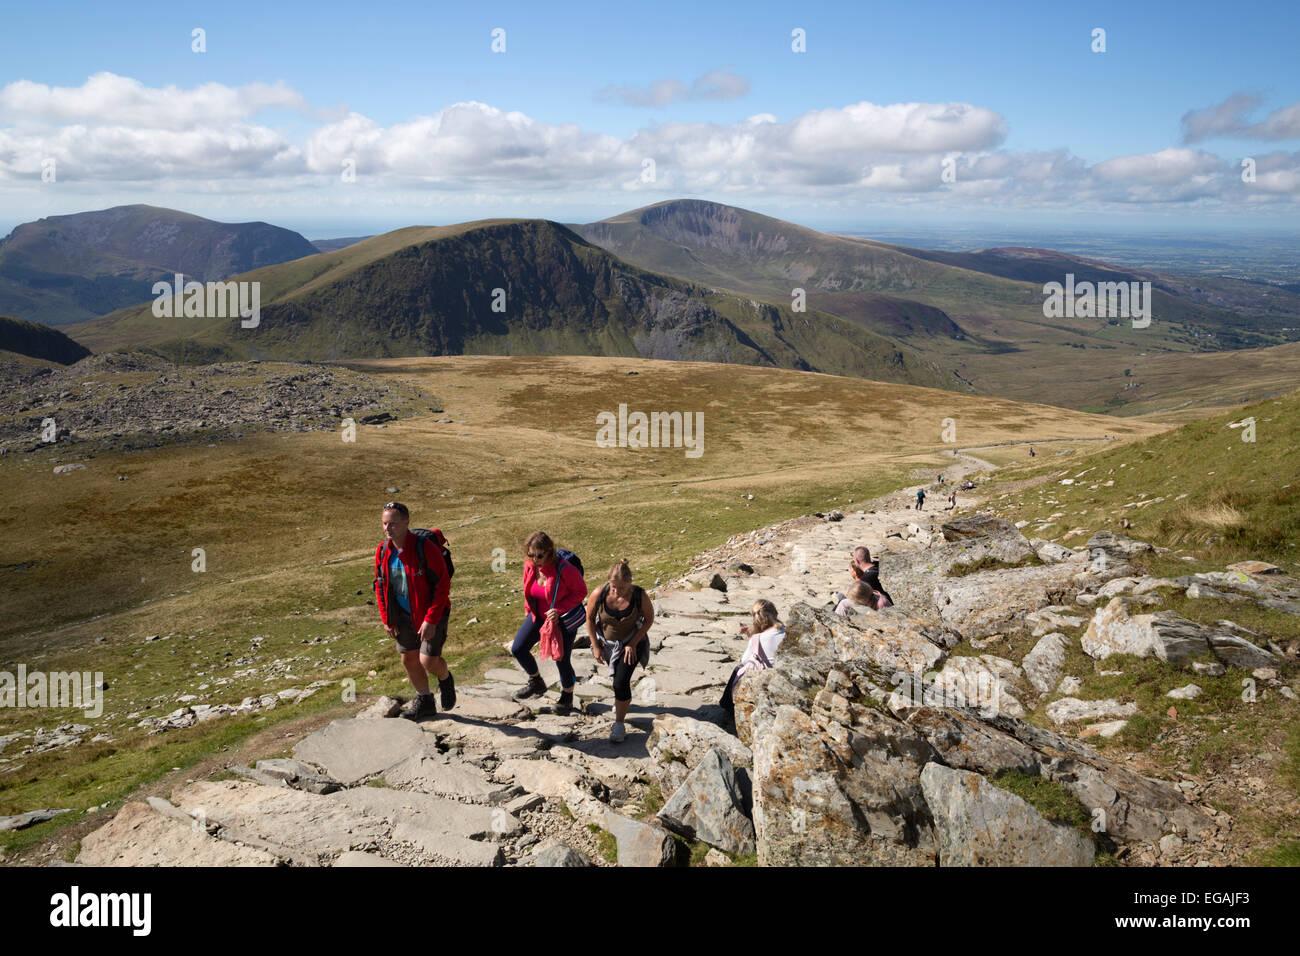 Walkers half way up Snowdon on the Llanberis path, Llanberis, Snowdonia National Park, Gwynedd, Wales; United Kingdom, - Stock Image